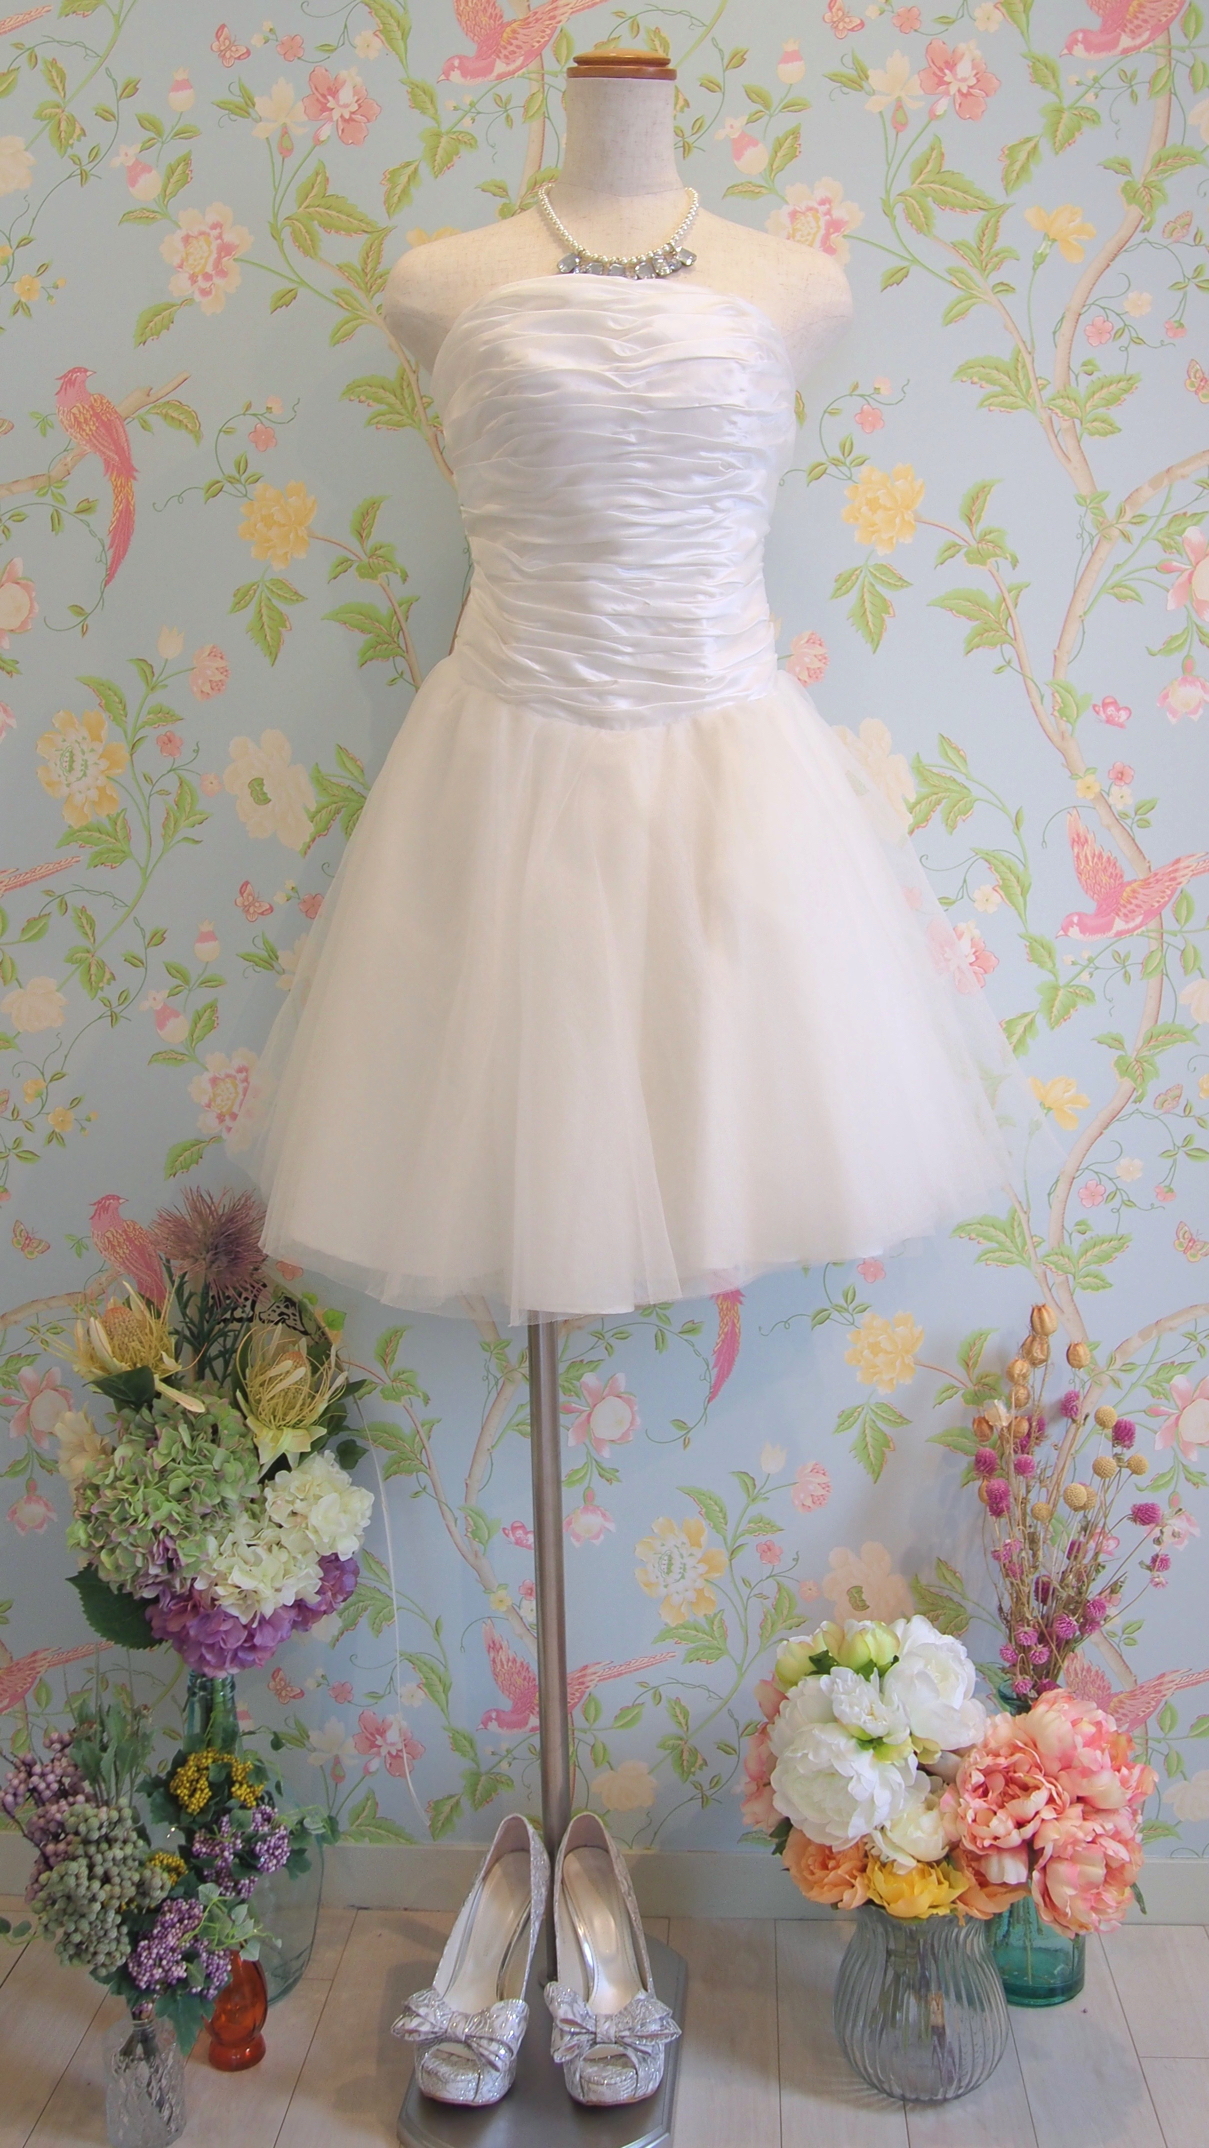 nr_dress_306